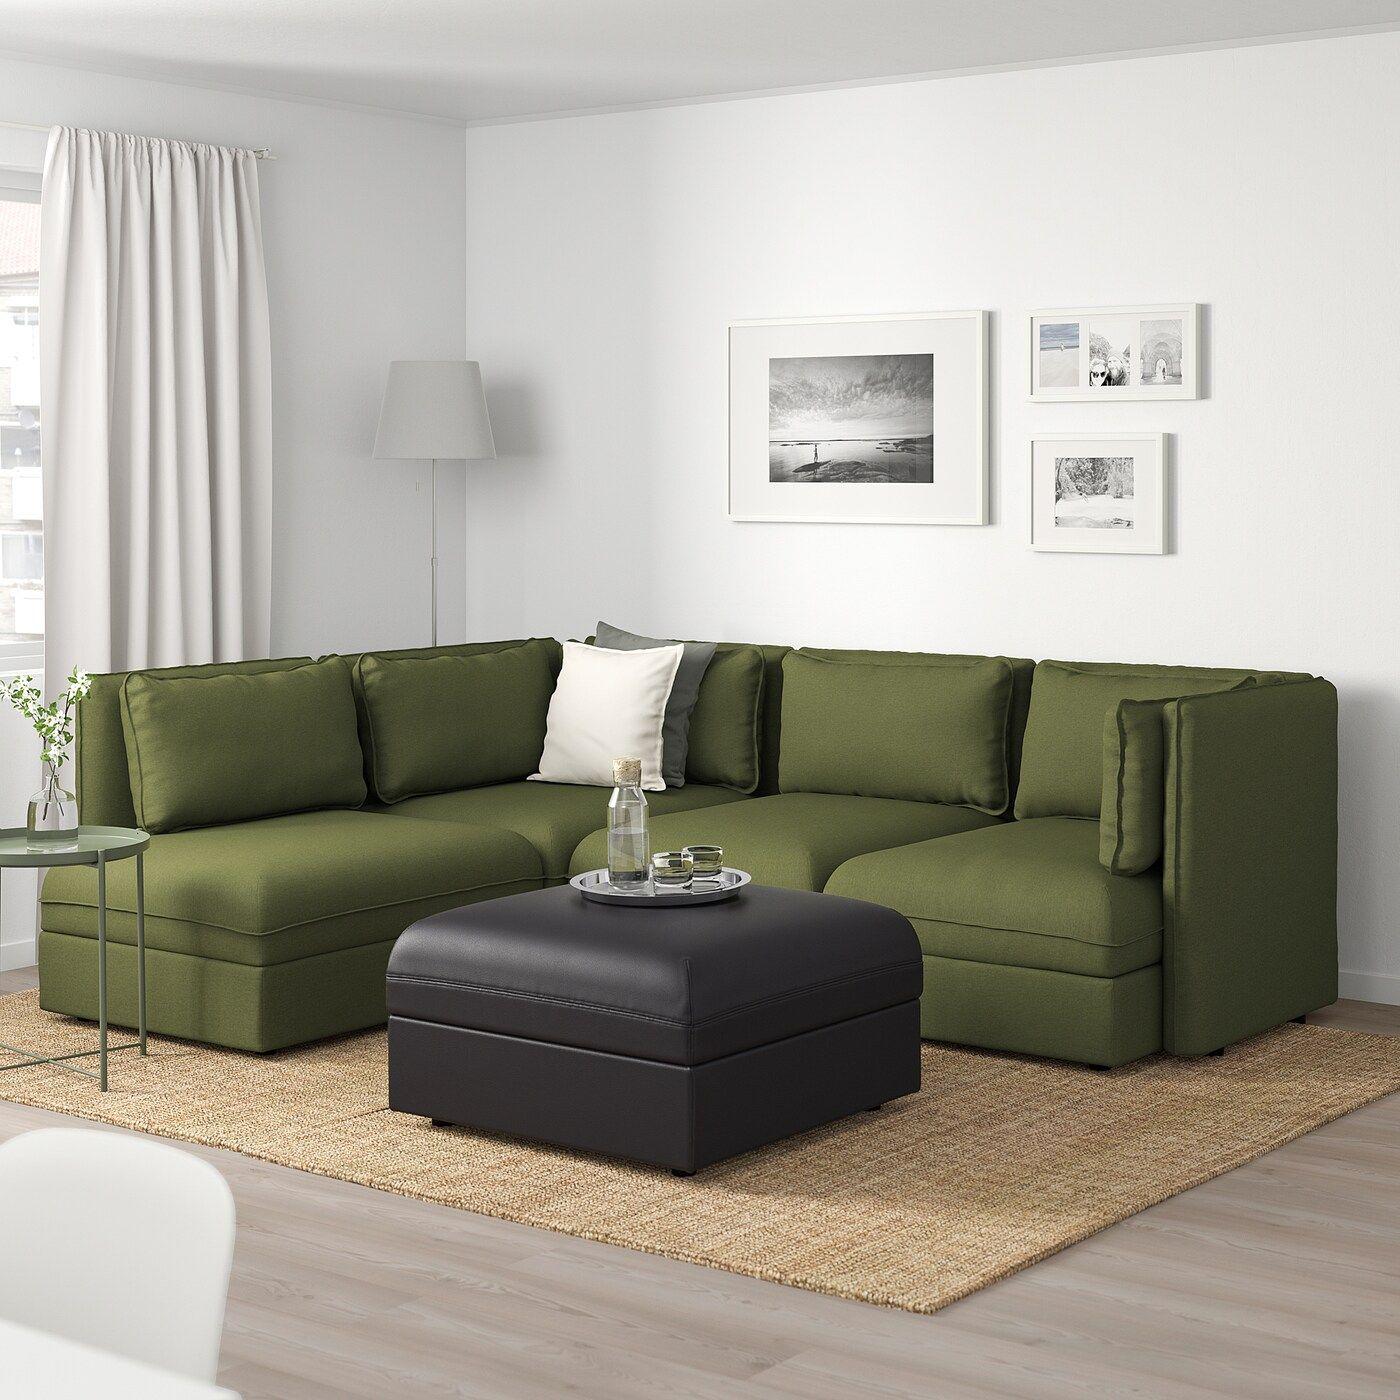 Vallentuna Modulecksofa 4 Sitzig Mit Stauraum Orrsta Murum Olivgrun Schwarz Ikea Osterreich Modular Corner Sofa Corner Sofa Green Sofa Living